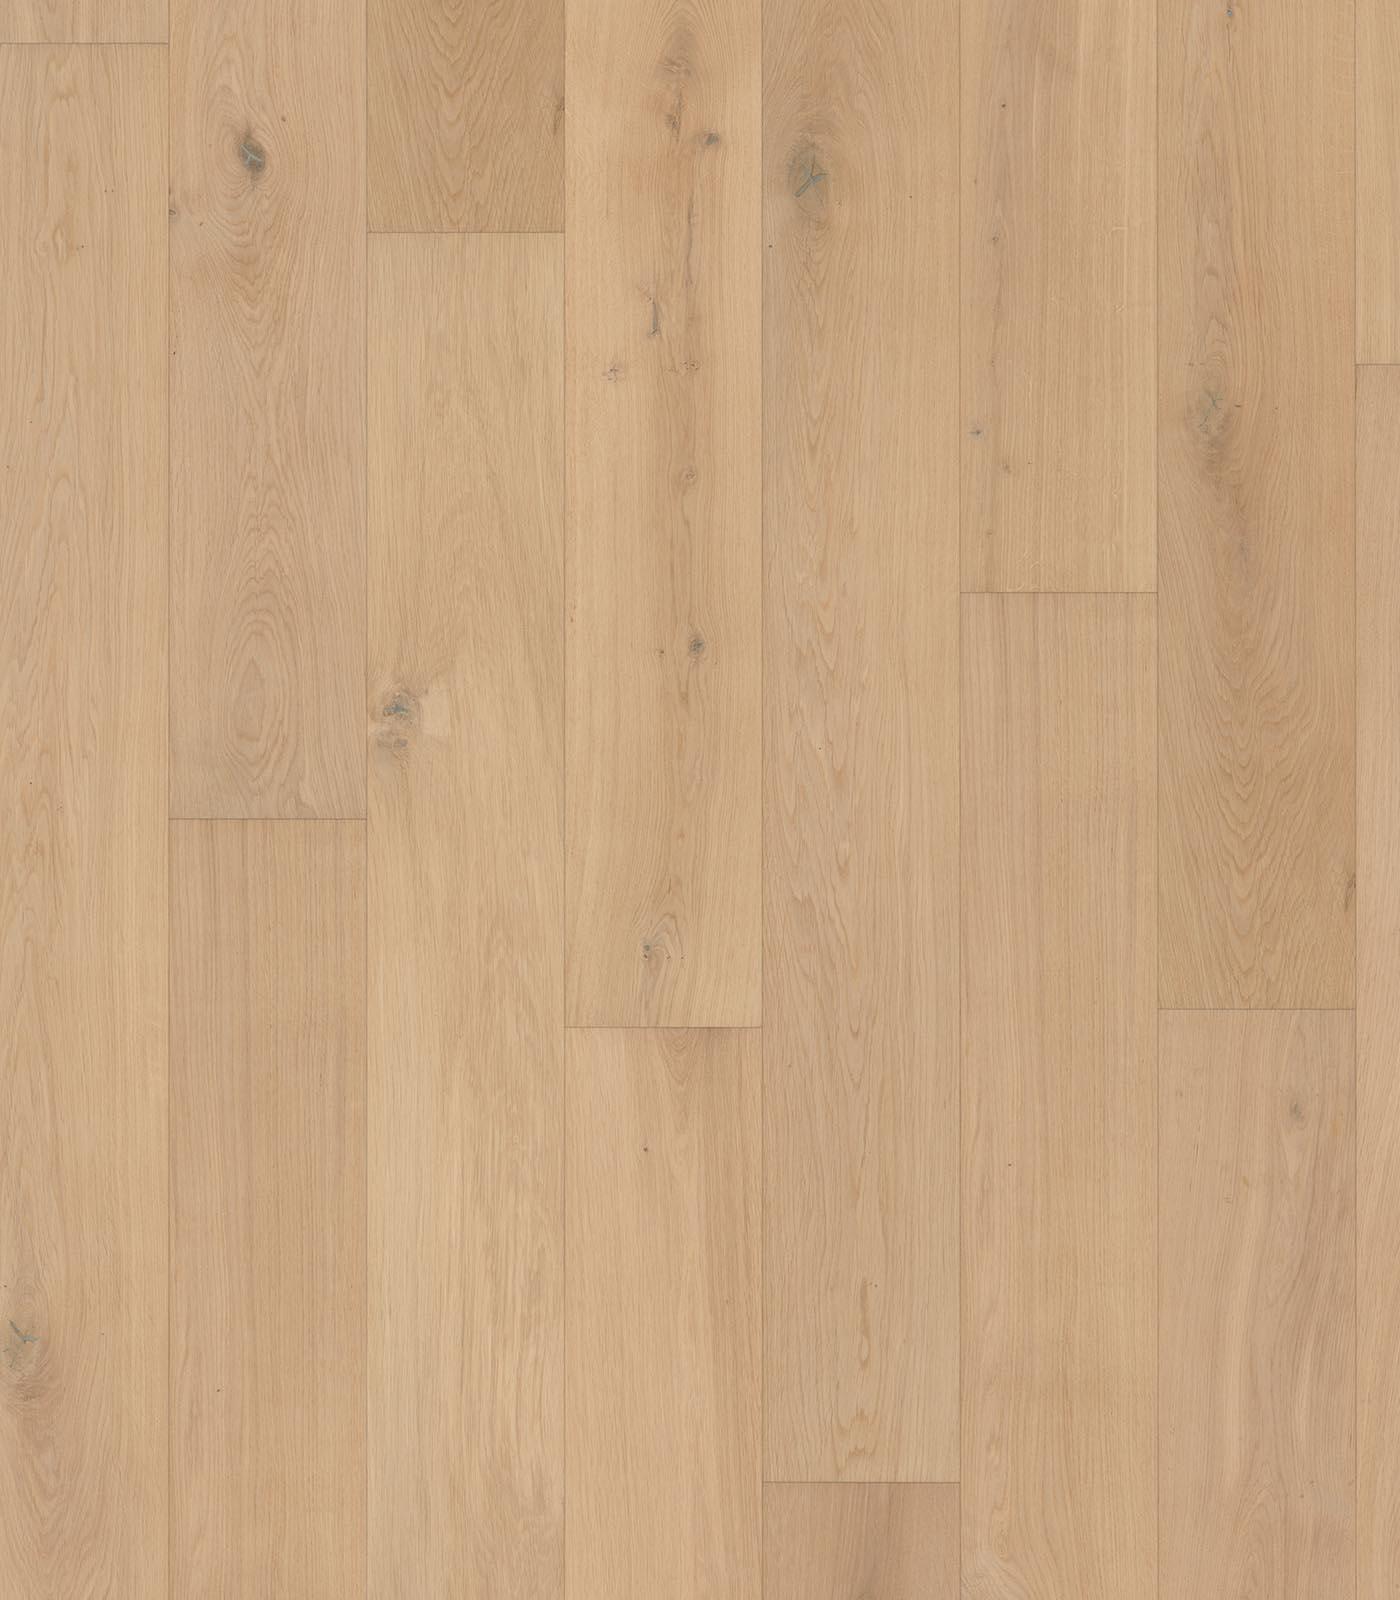 Absolute-Floors european Oak-Origins Collection-flat